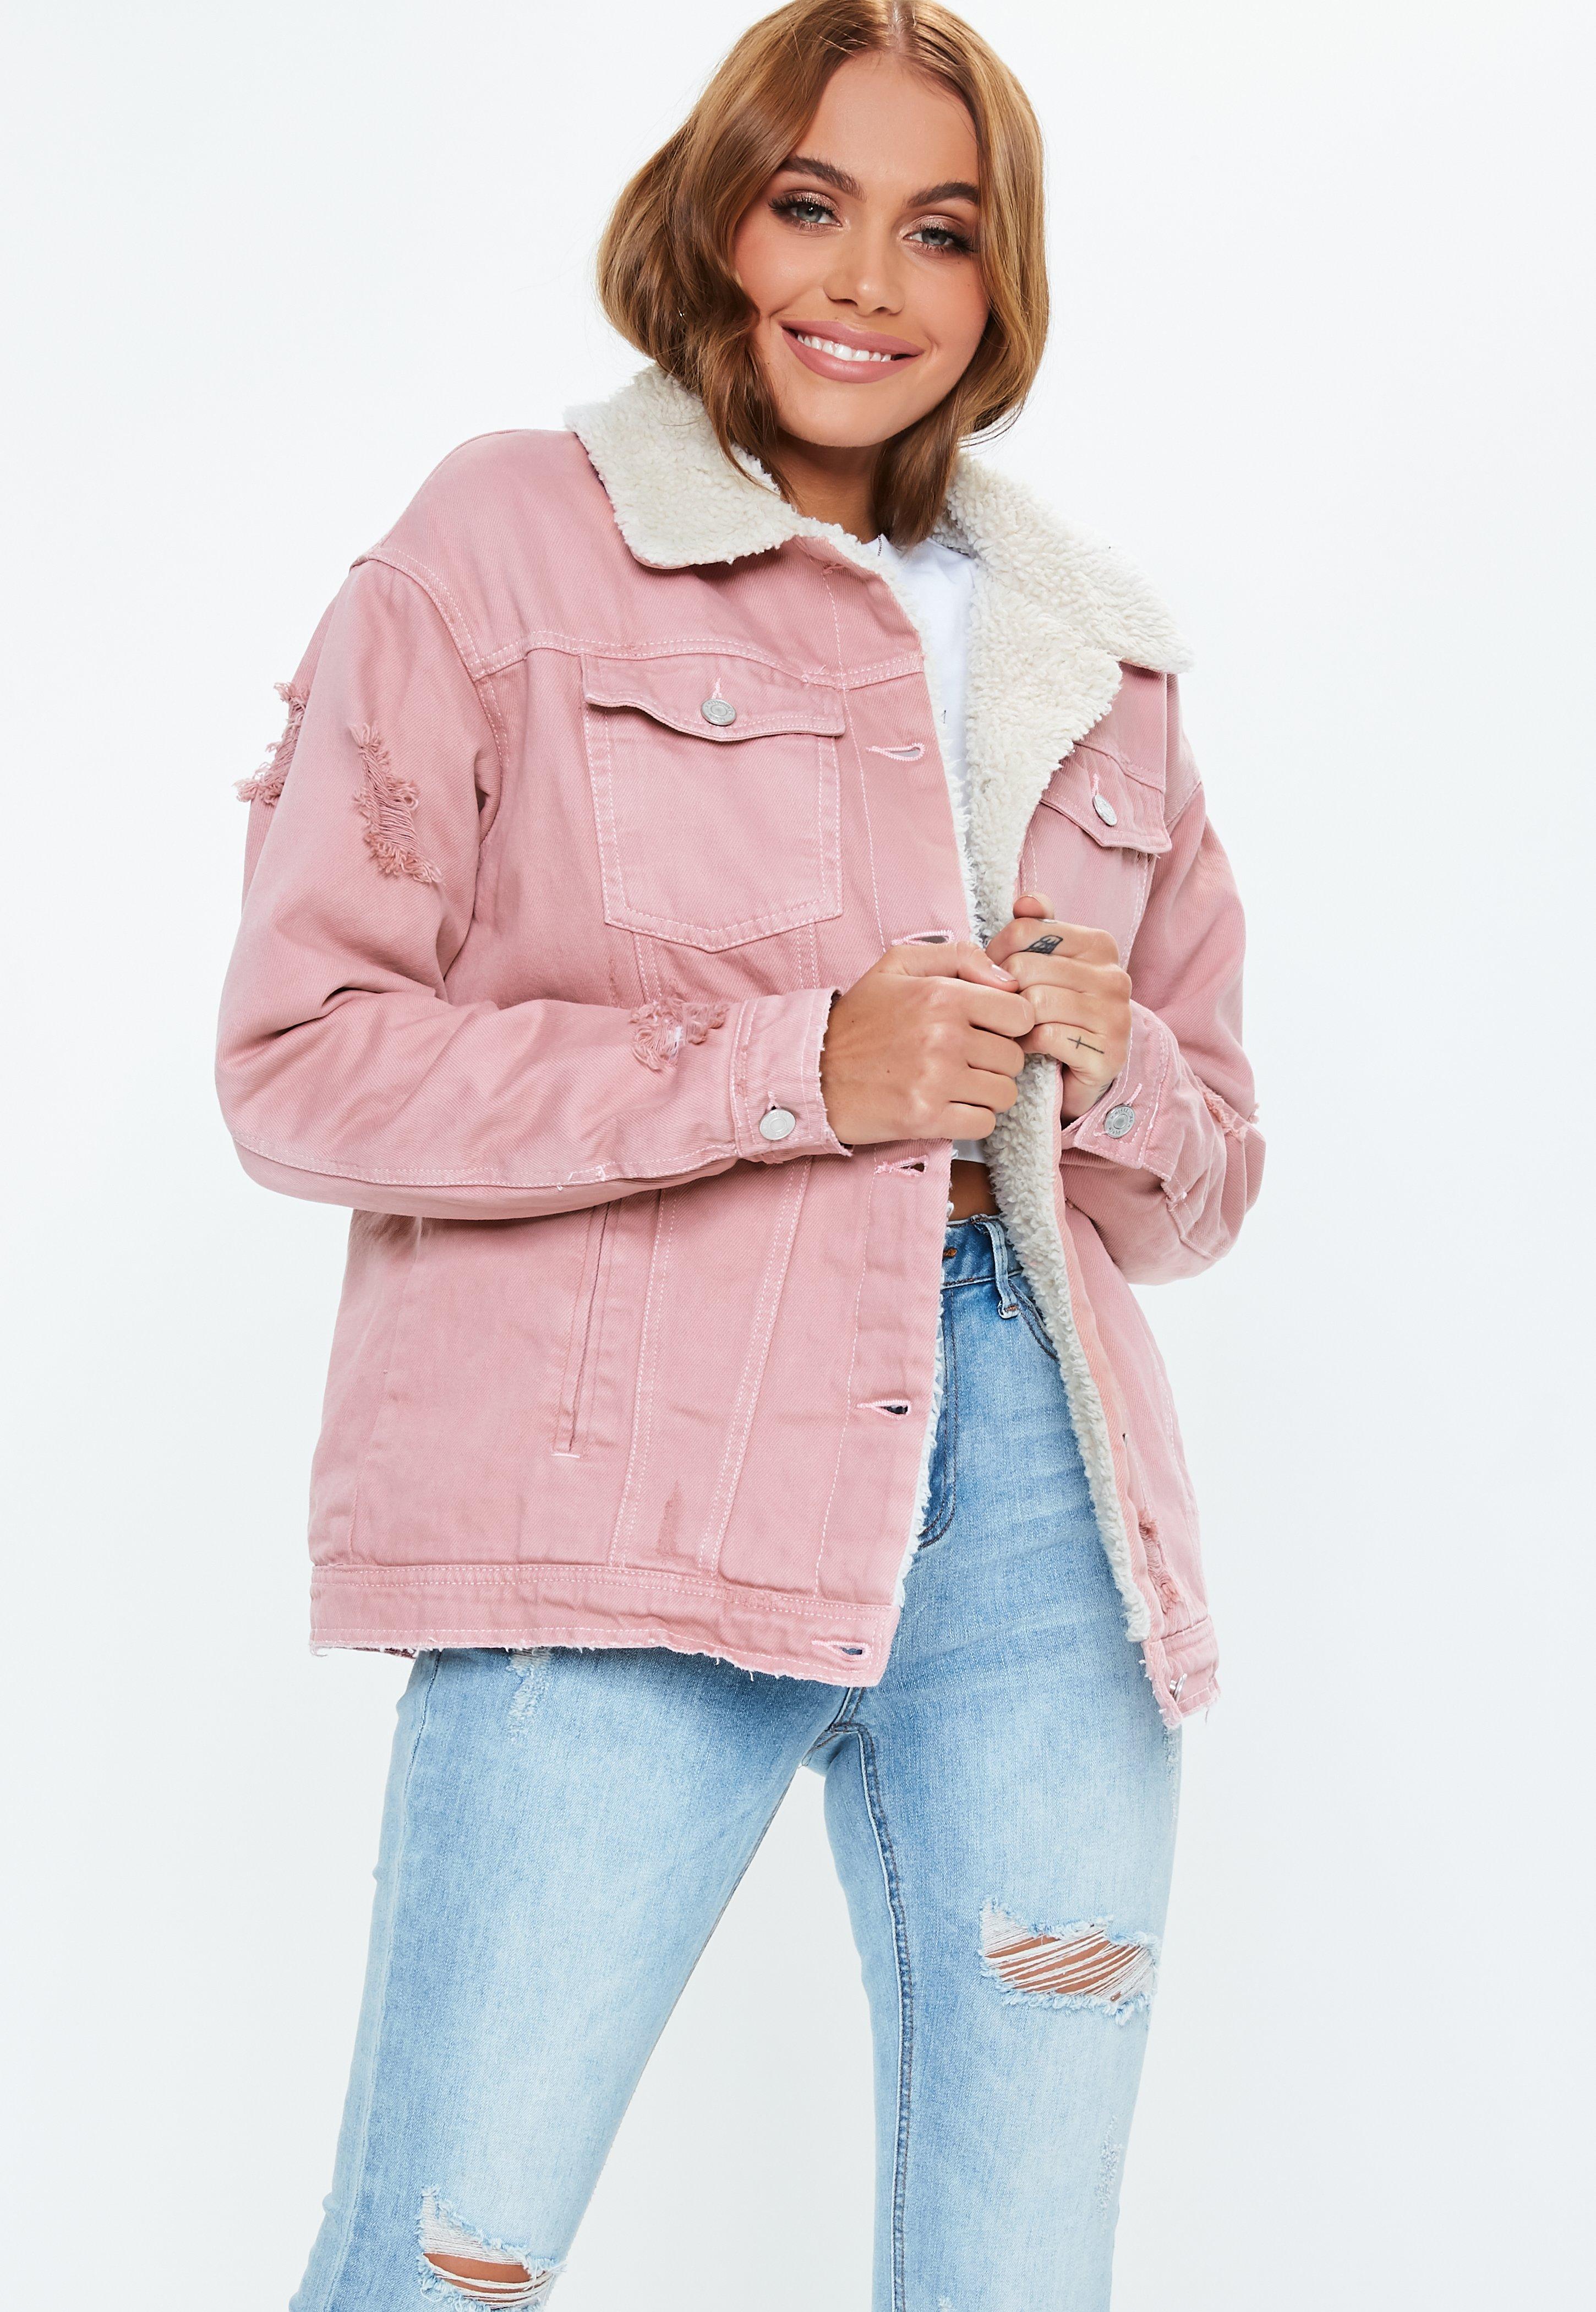 97a7bd5685 Women coats jackets online missguided jpg 258x374 Jean jacket pink dress